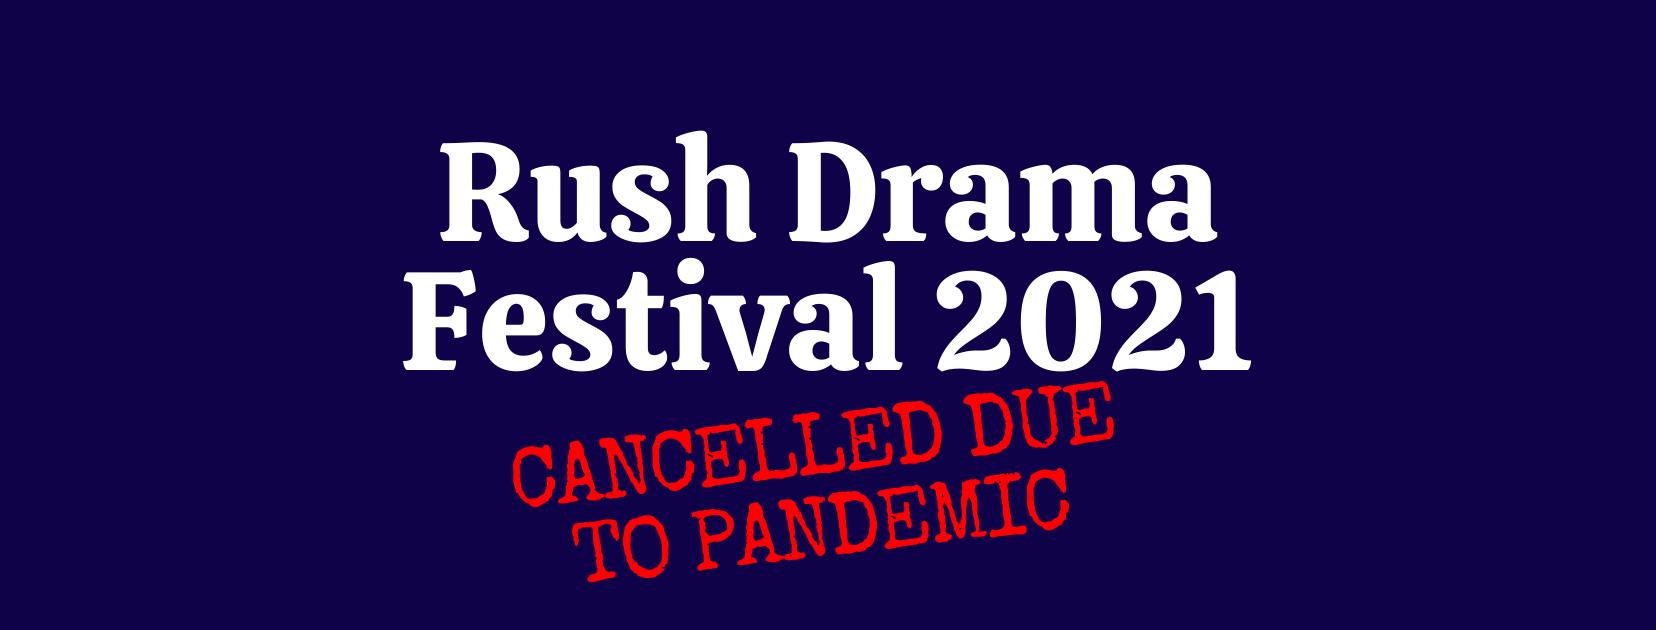 Rush Drama Festival 2021